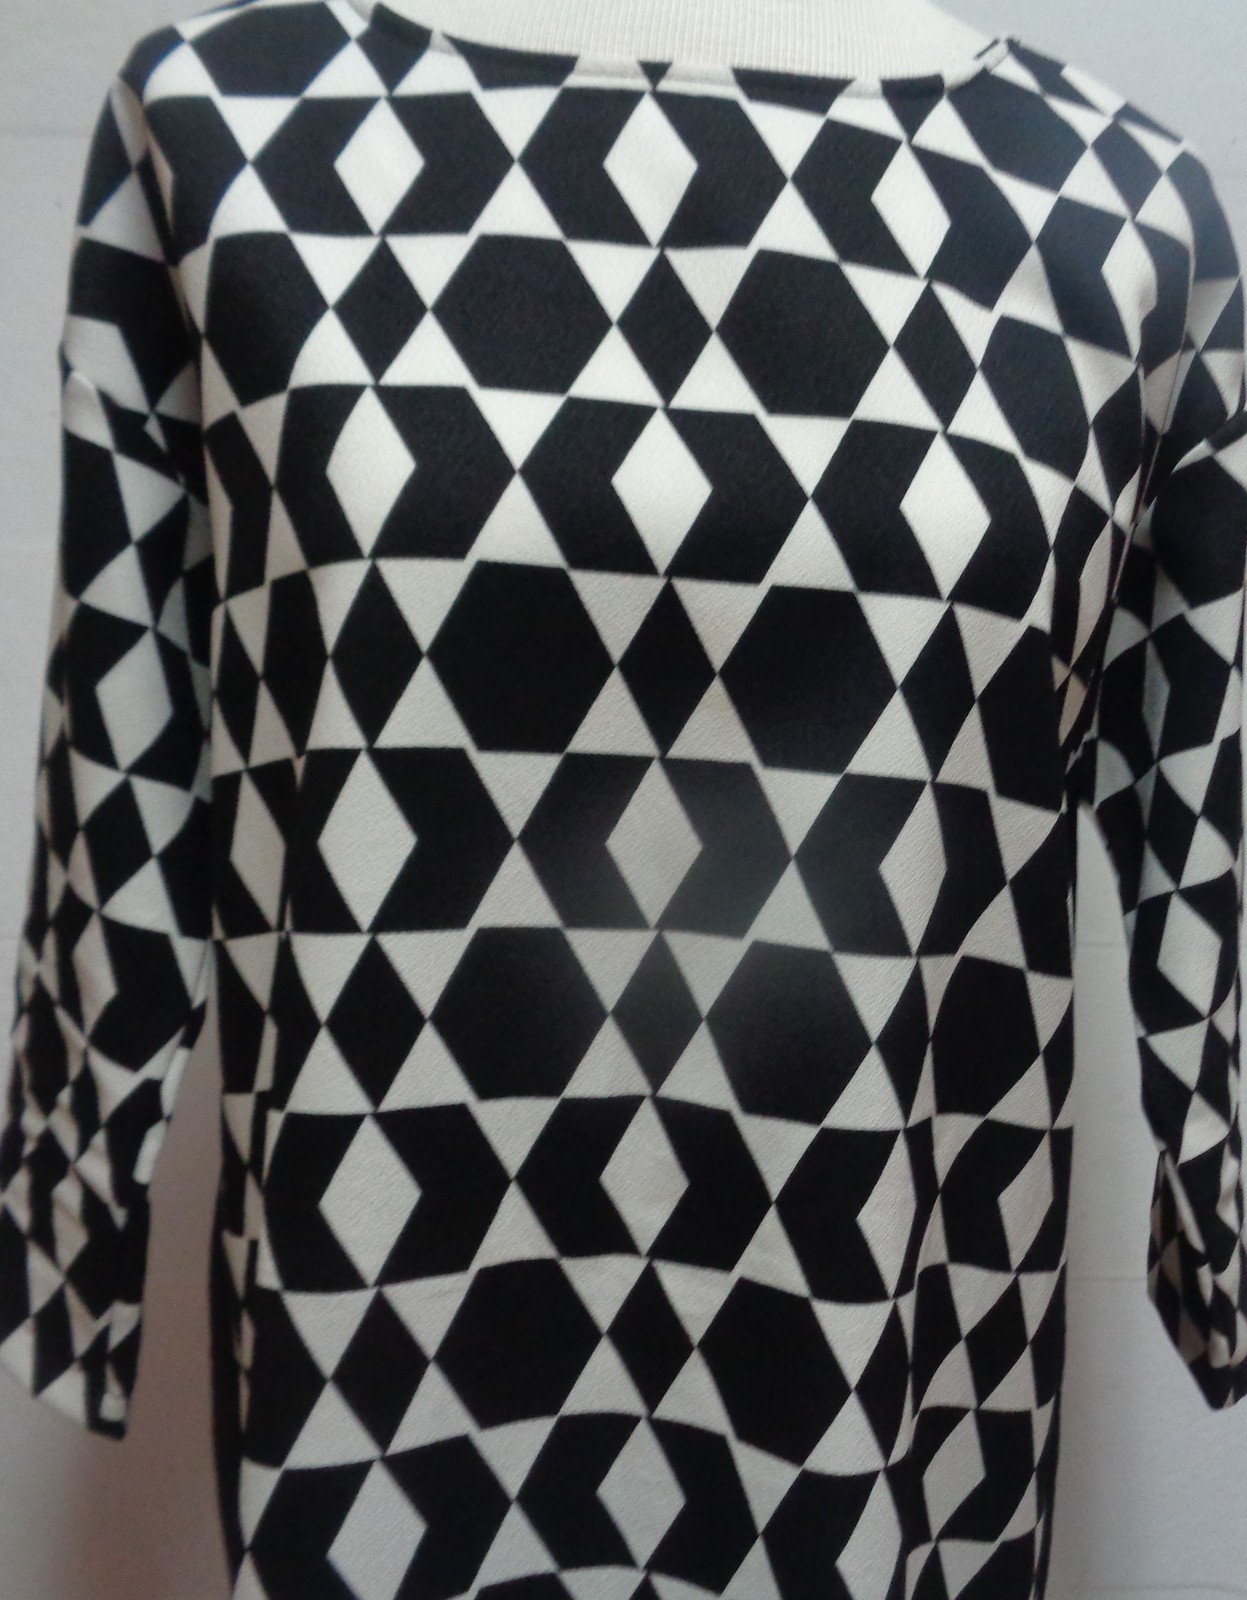 Women's Black & White Geometric Shirt Dress NWOT SZ Small Free Shipping